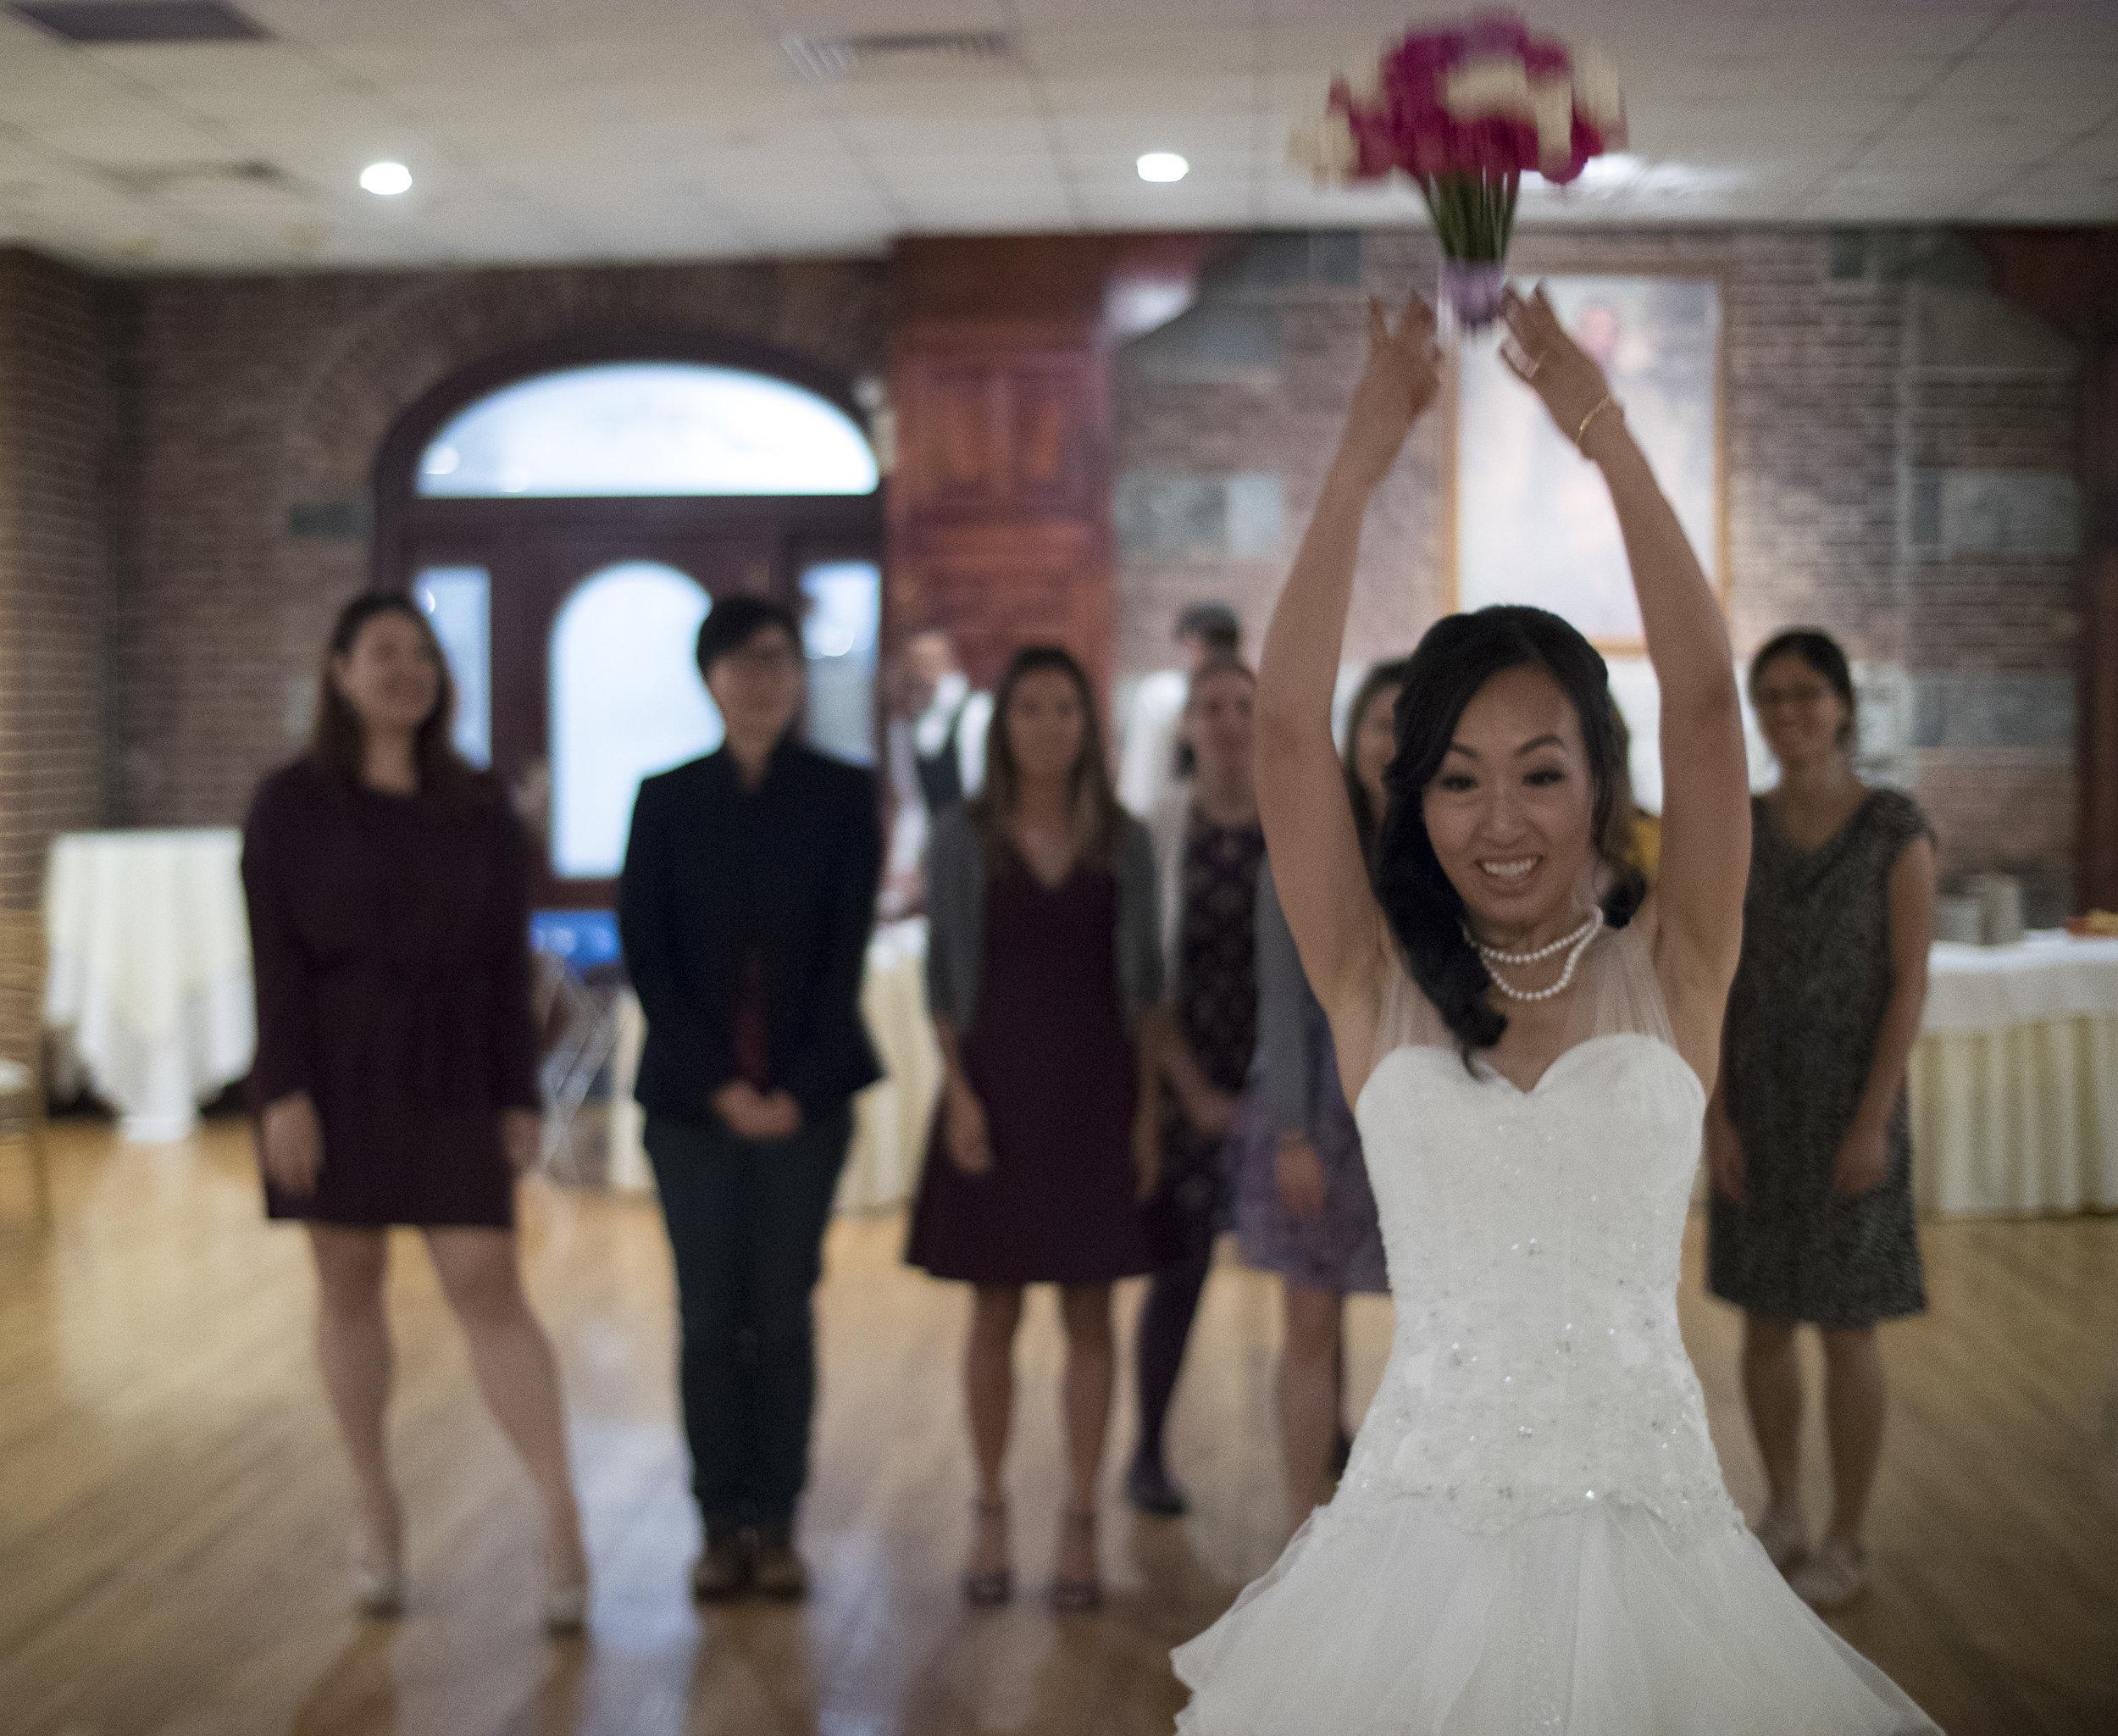 K_S bride bouquet 3.jpg